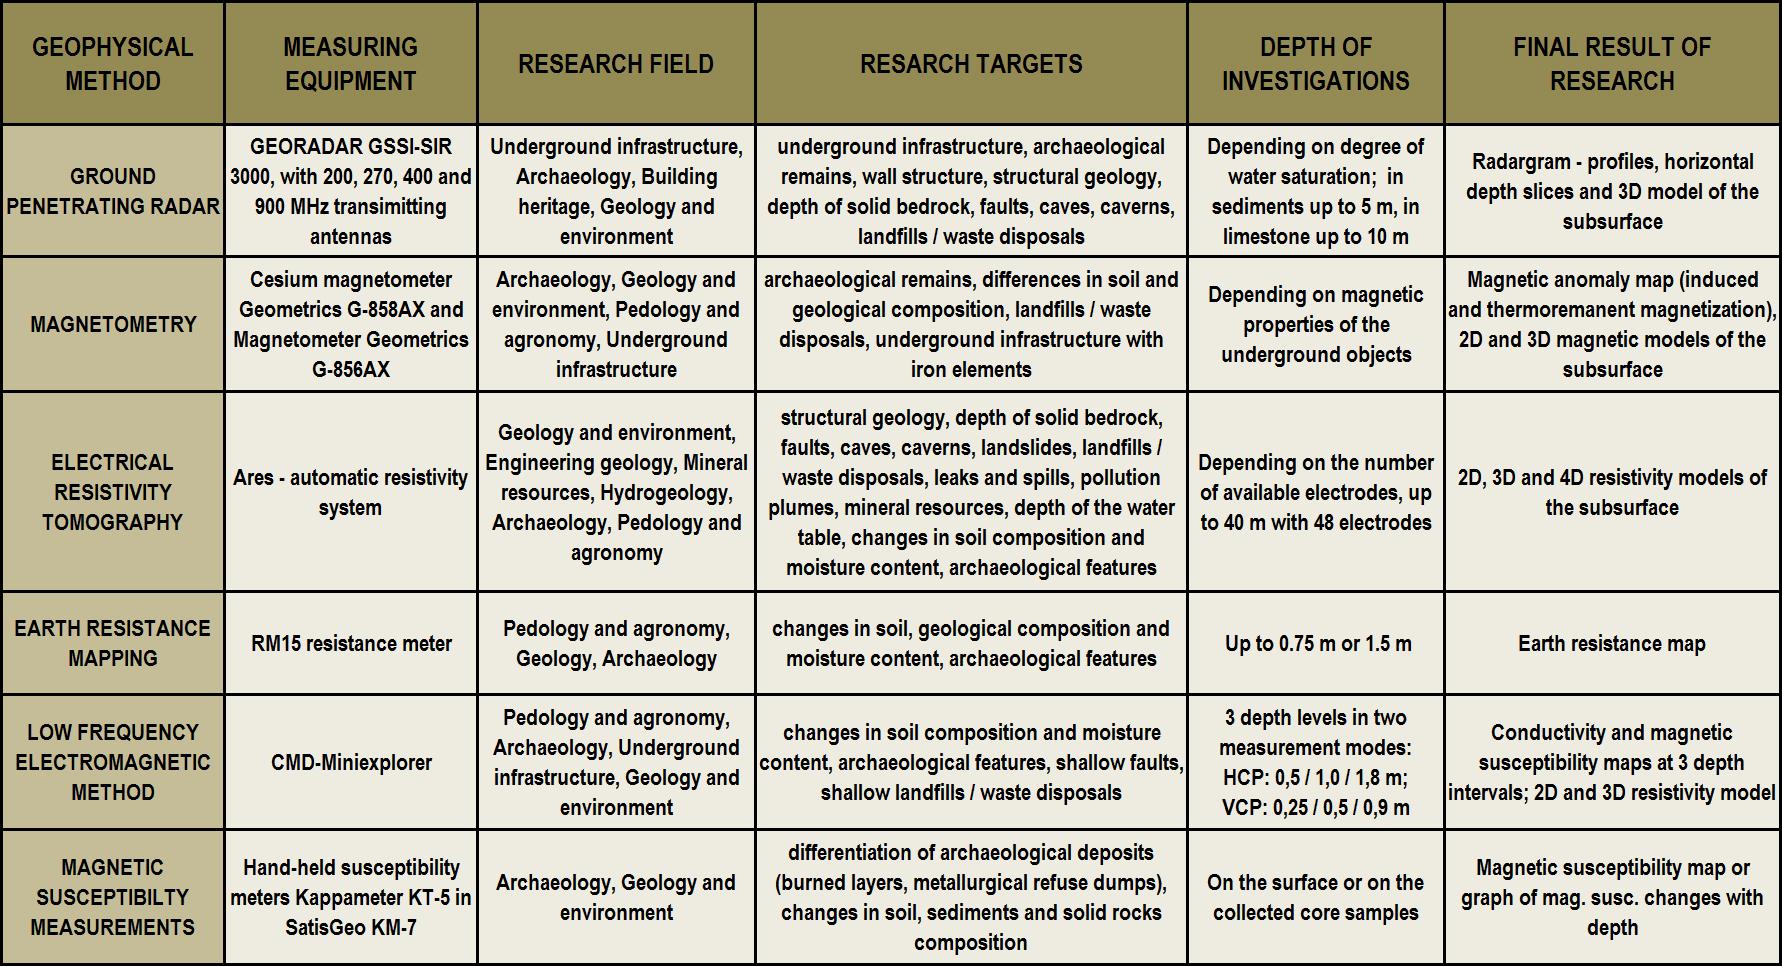 Geophysical methods - table